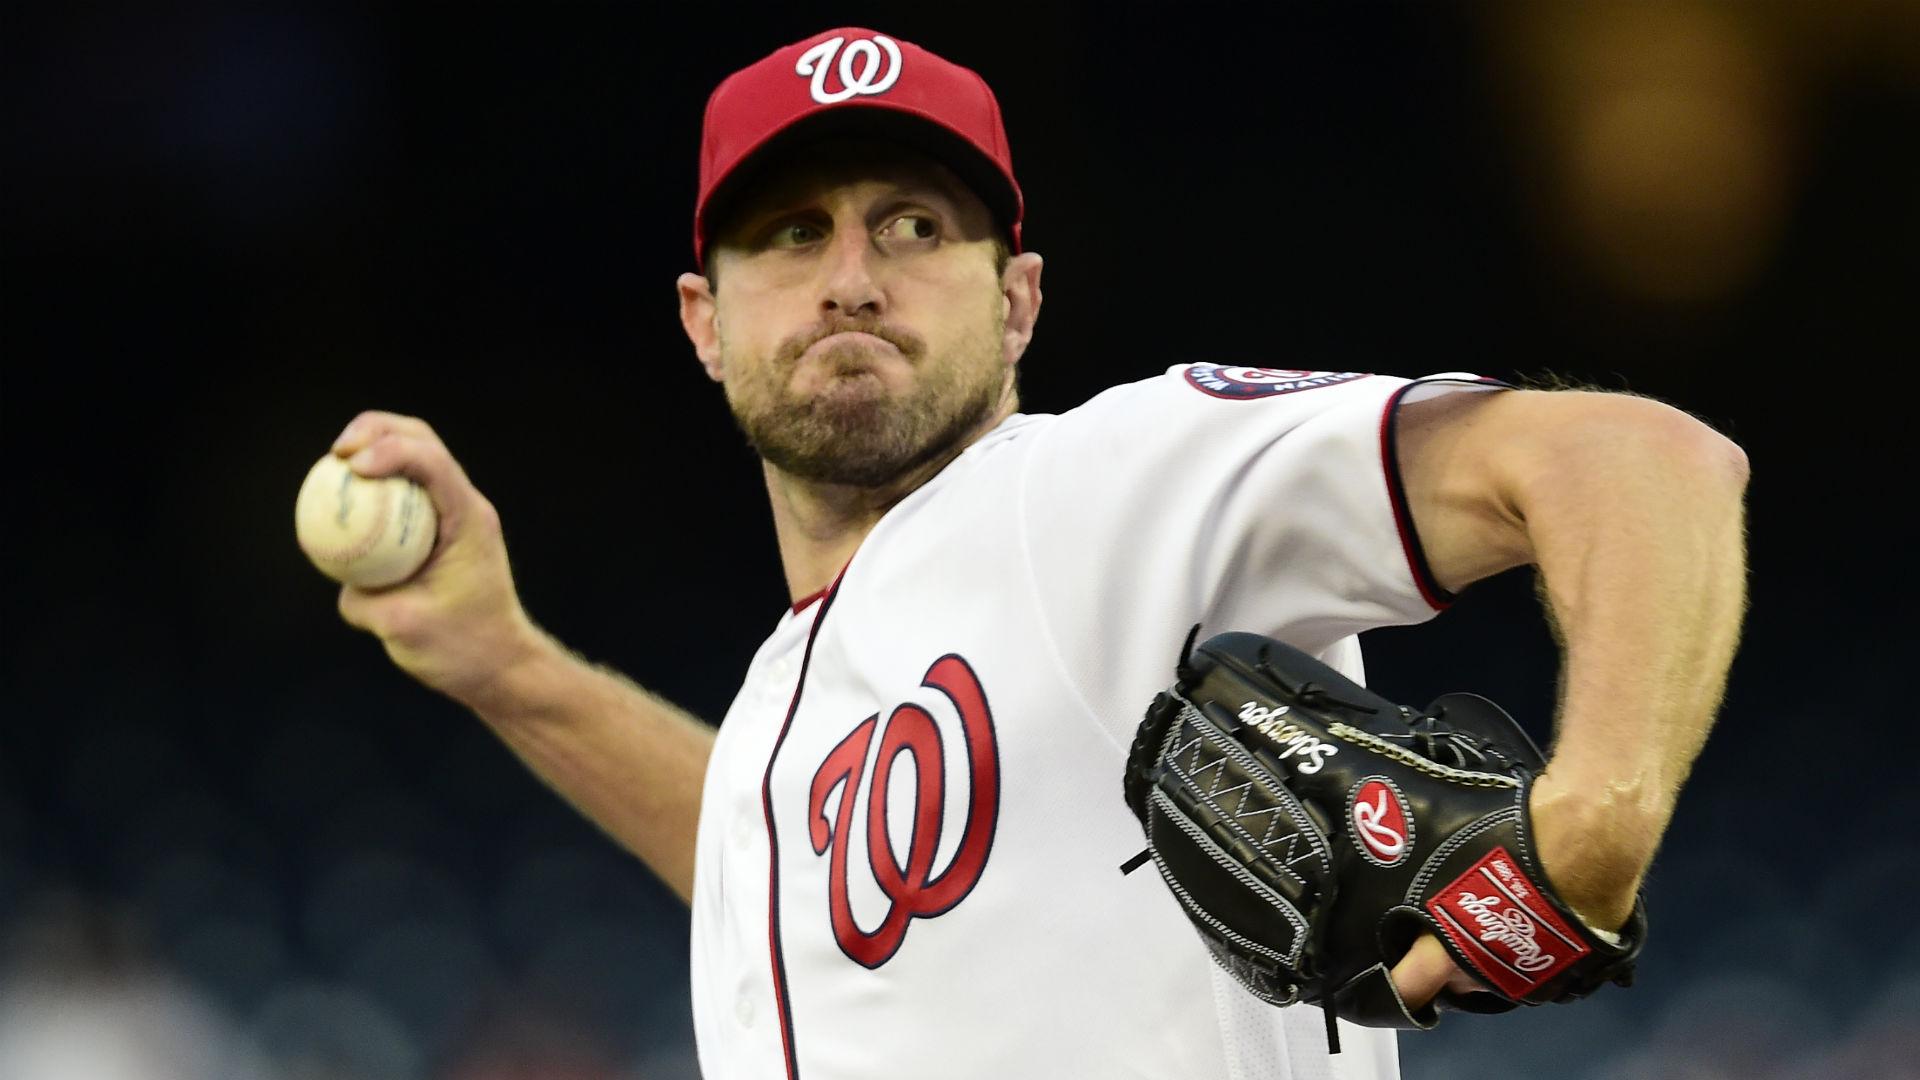 Nationals' Max Scherzer leaves start vs. Mets after one inning